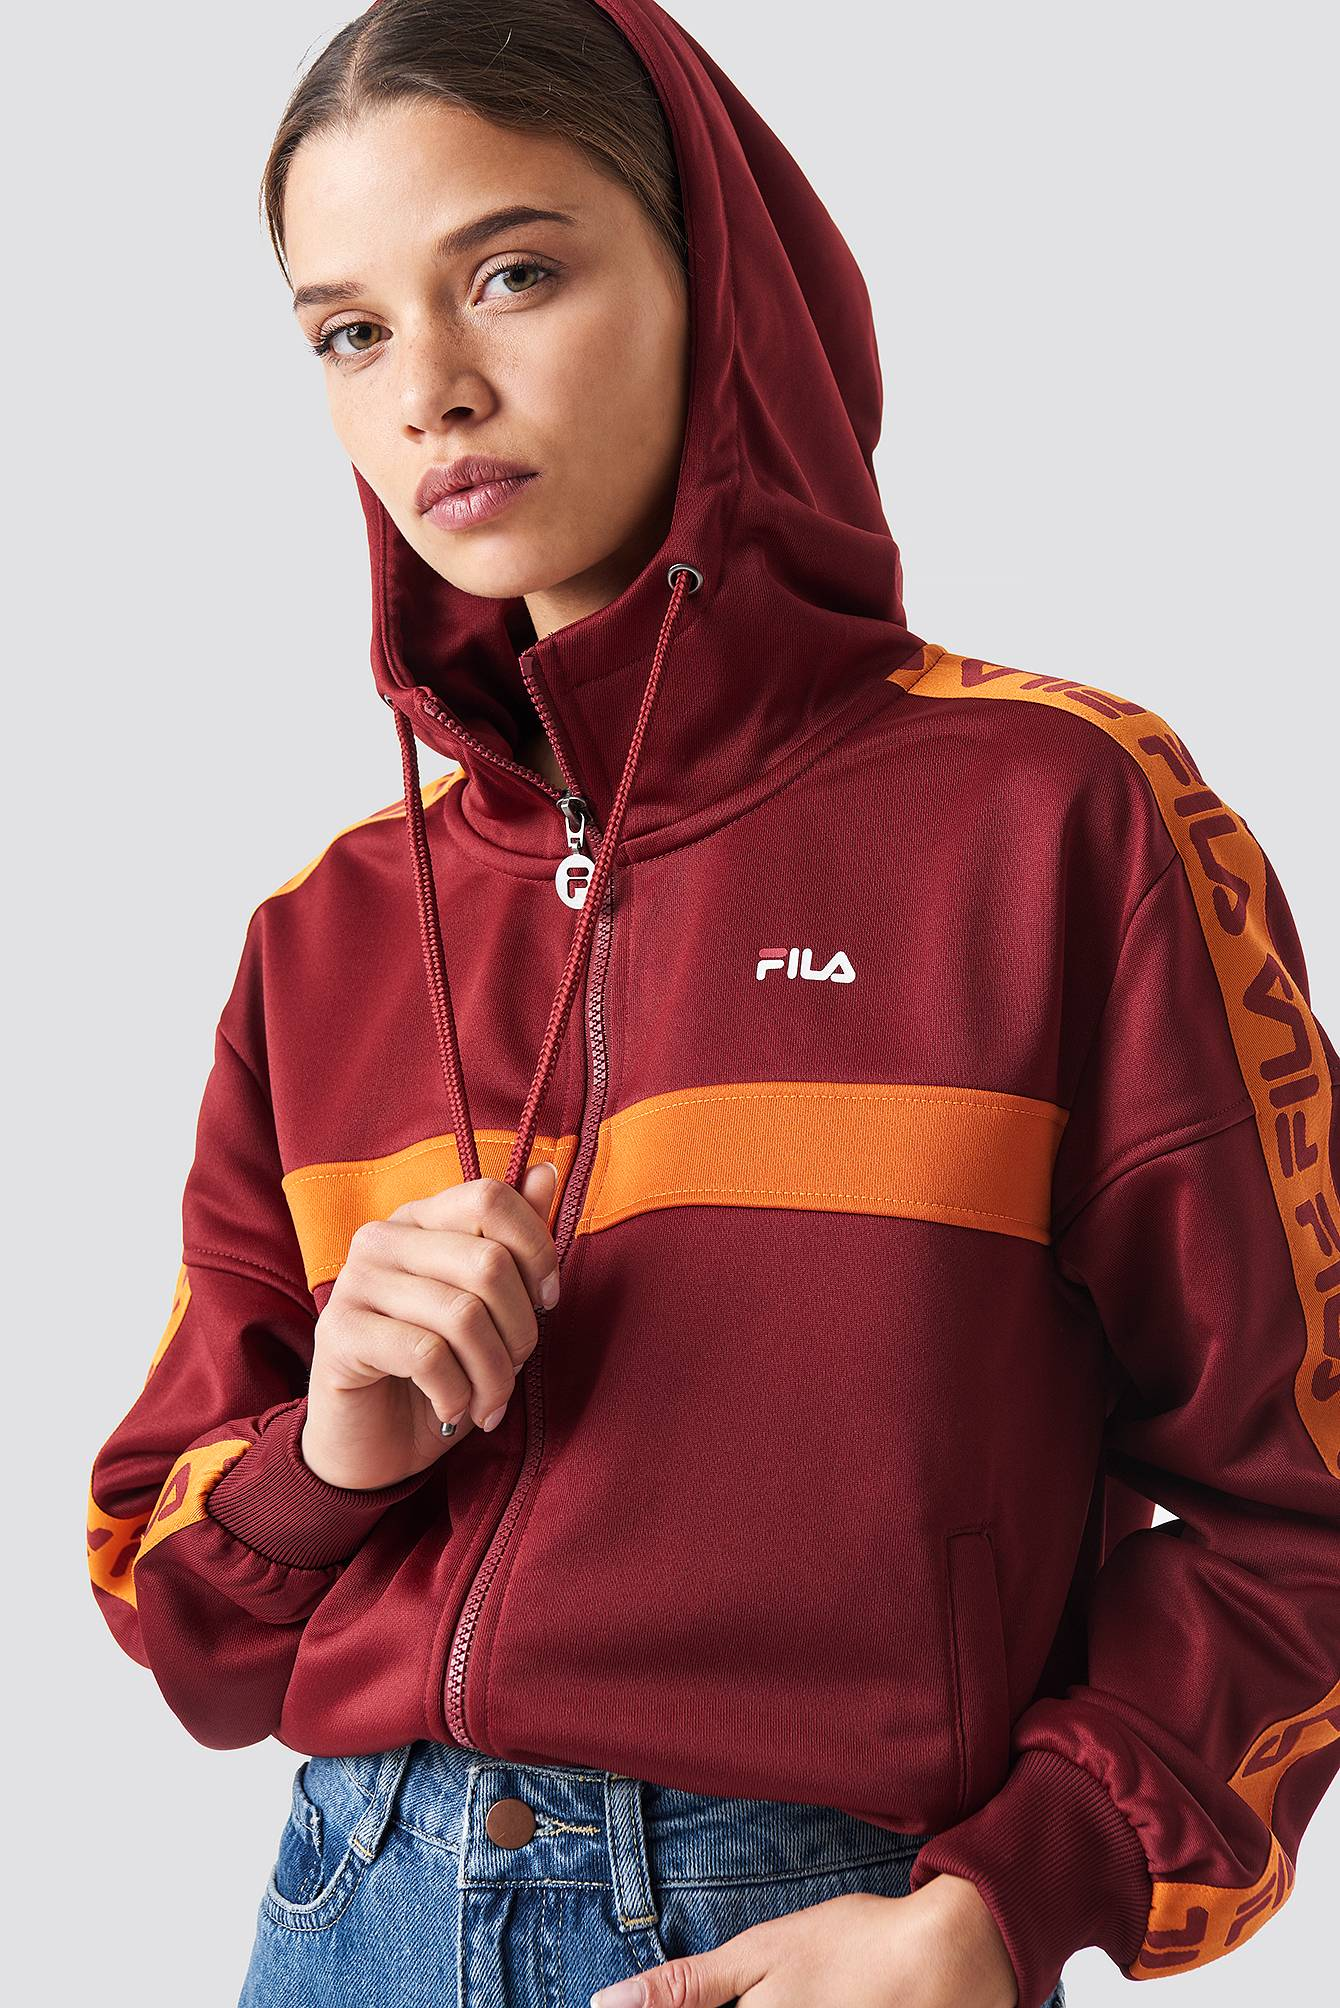 FILA Teela Track Hodded Zip - Red  - Size: Small